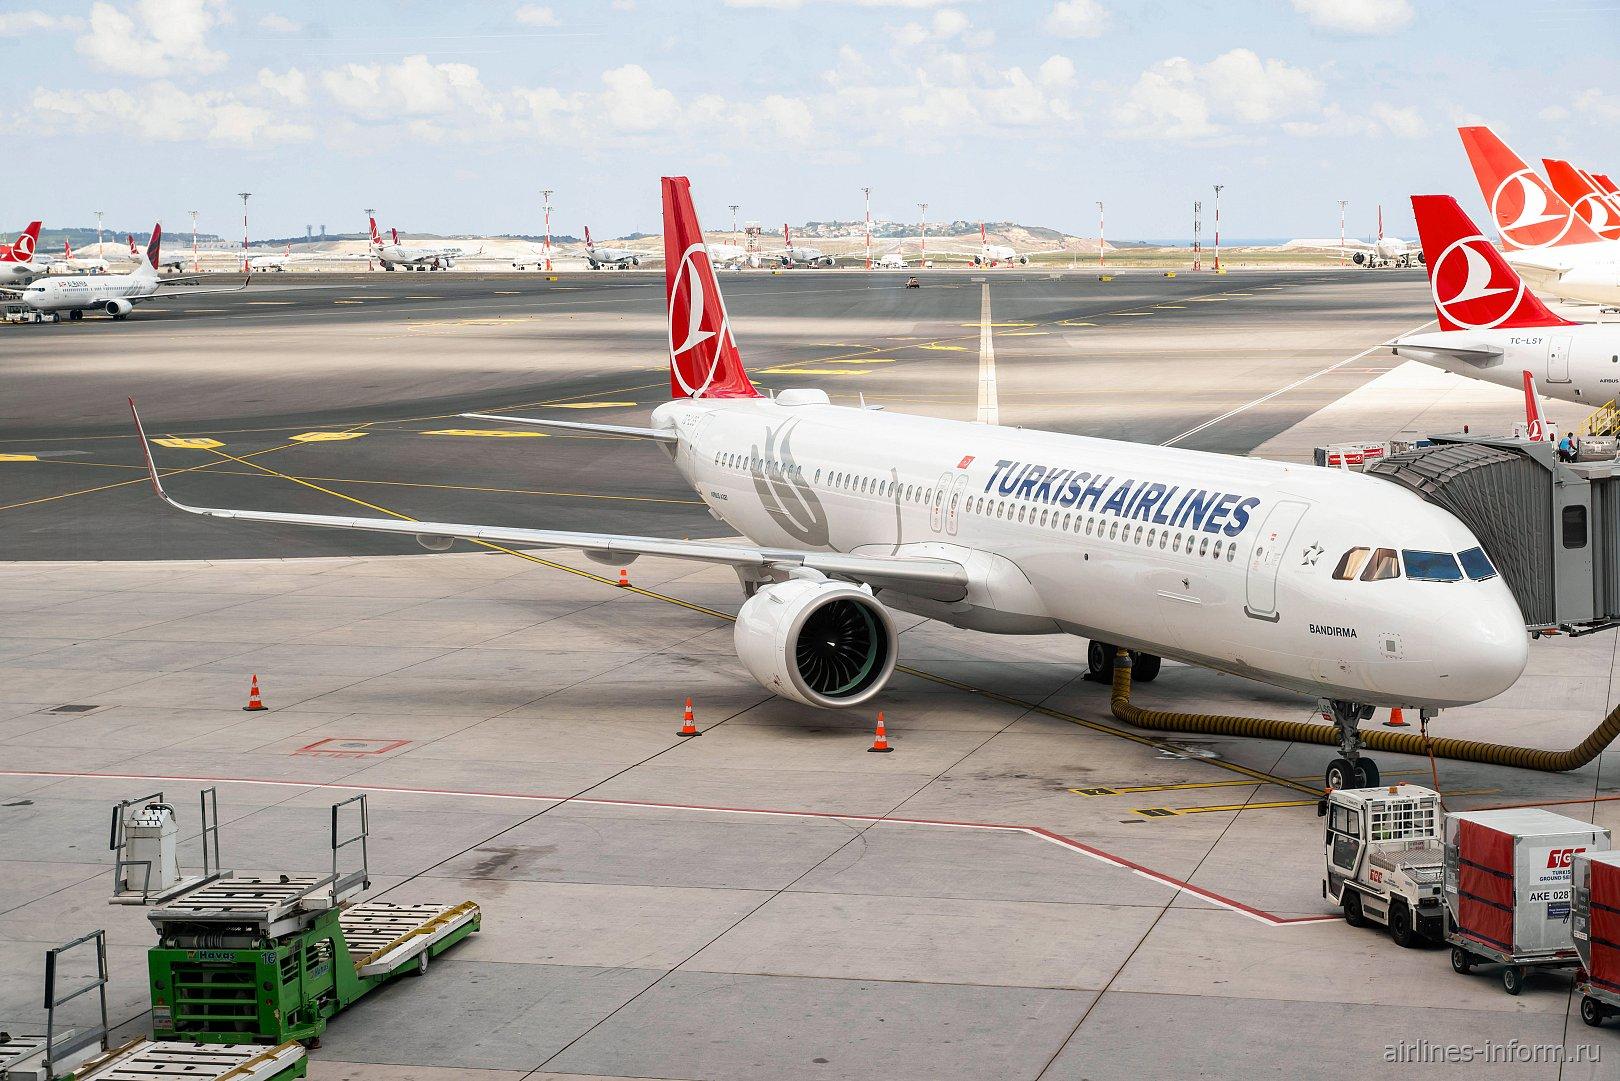 Airbus A321neo Турецких авиалиний в аэропорту Стамбула